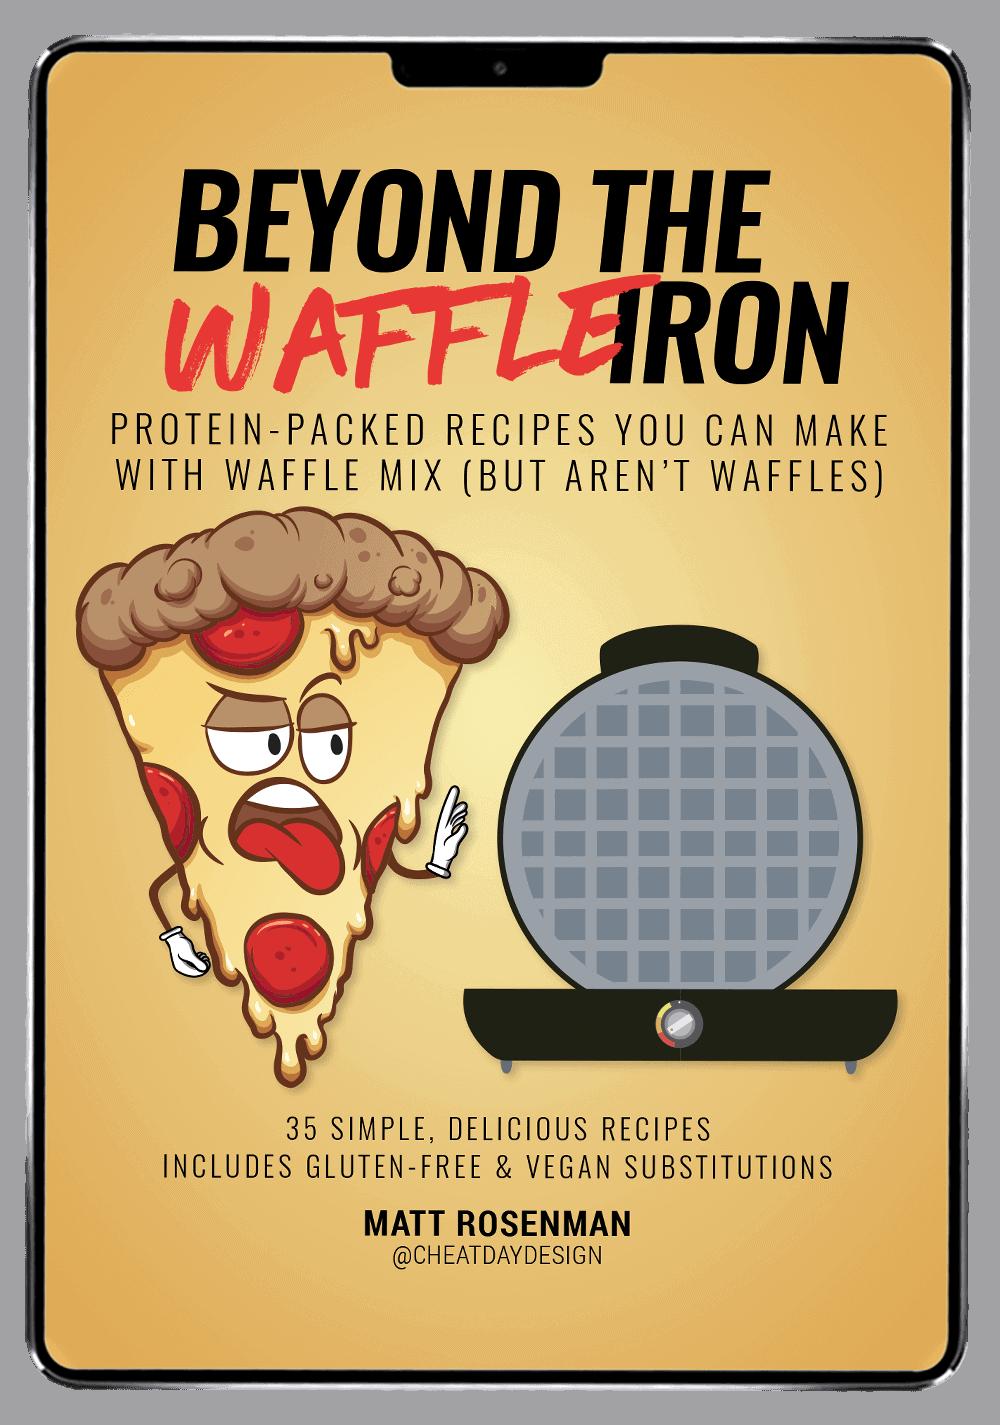 Beyond the waffle iron